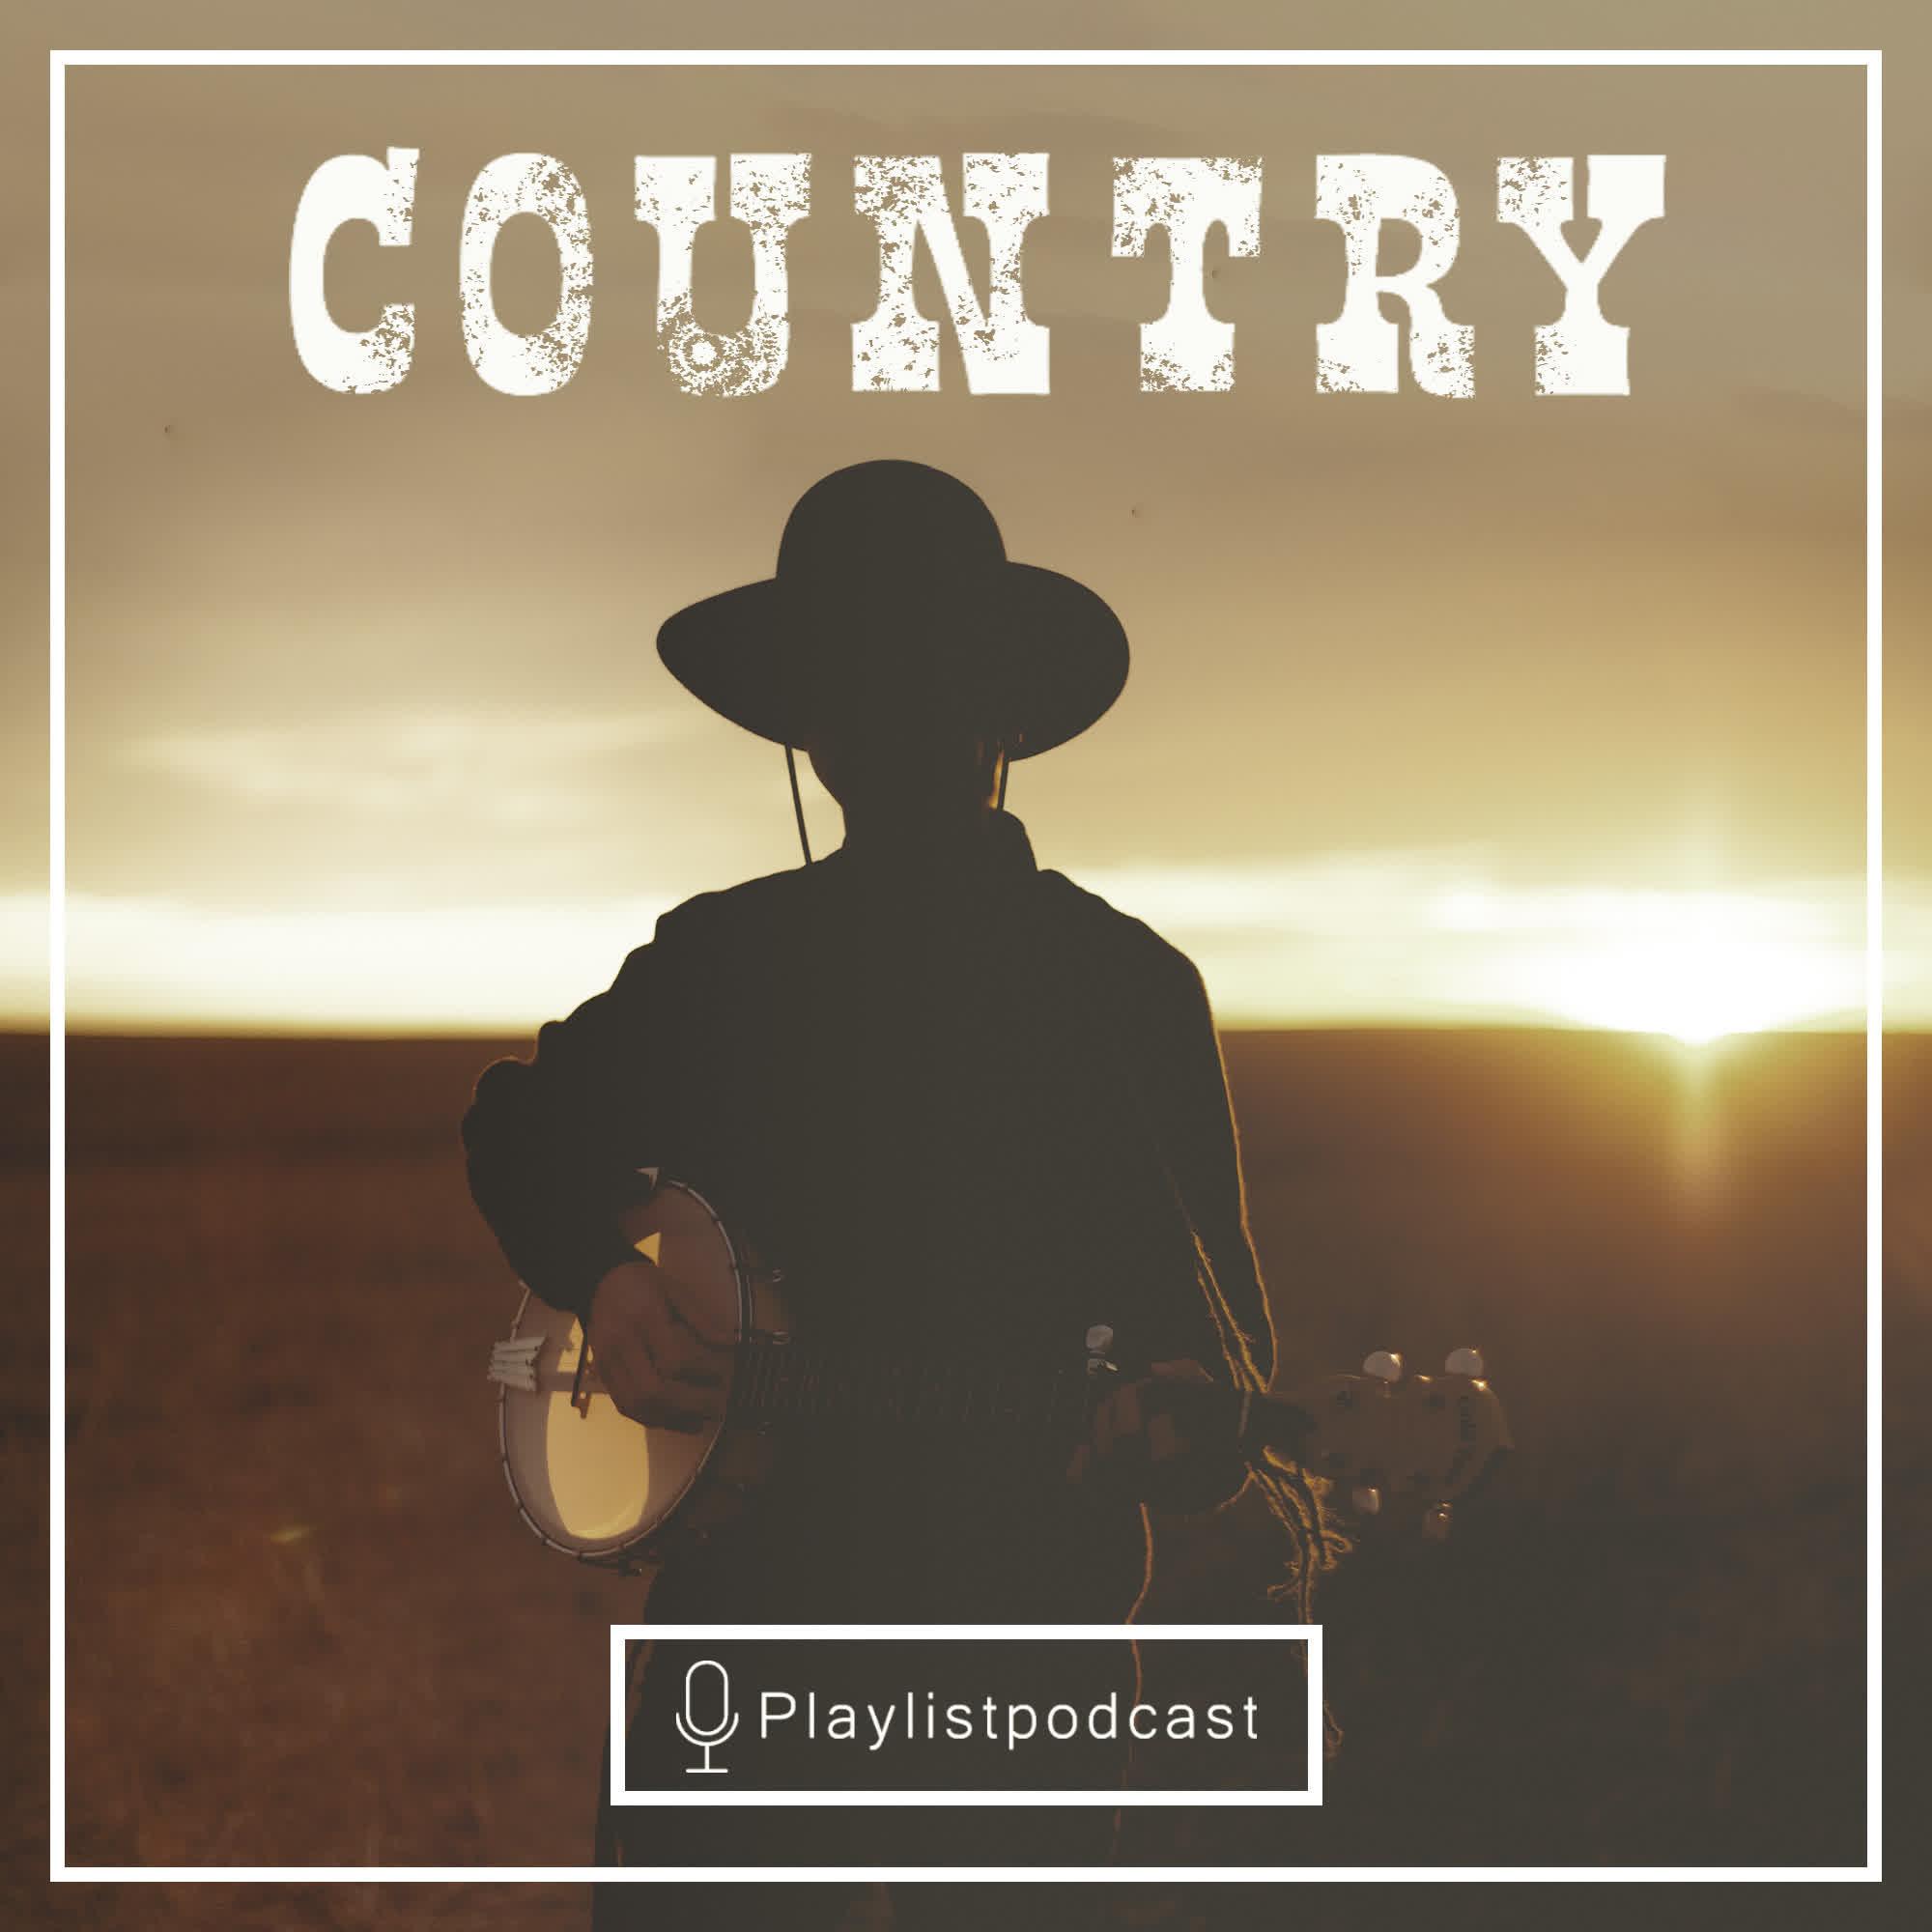 LIVE 128 - Country 2 - پلی لیست لایو